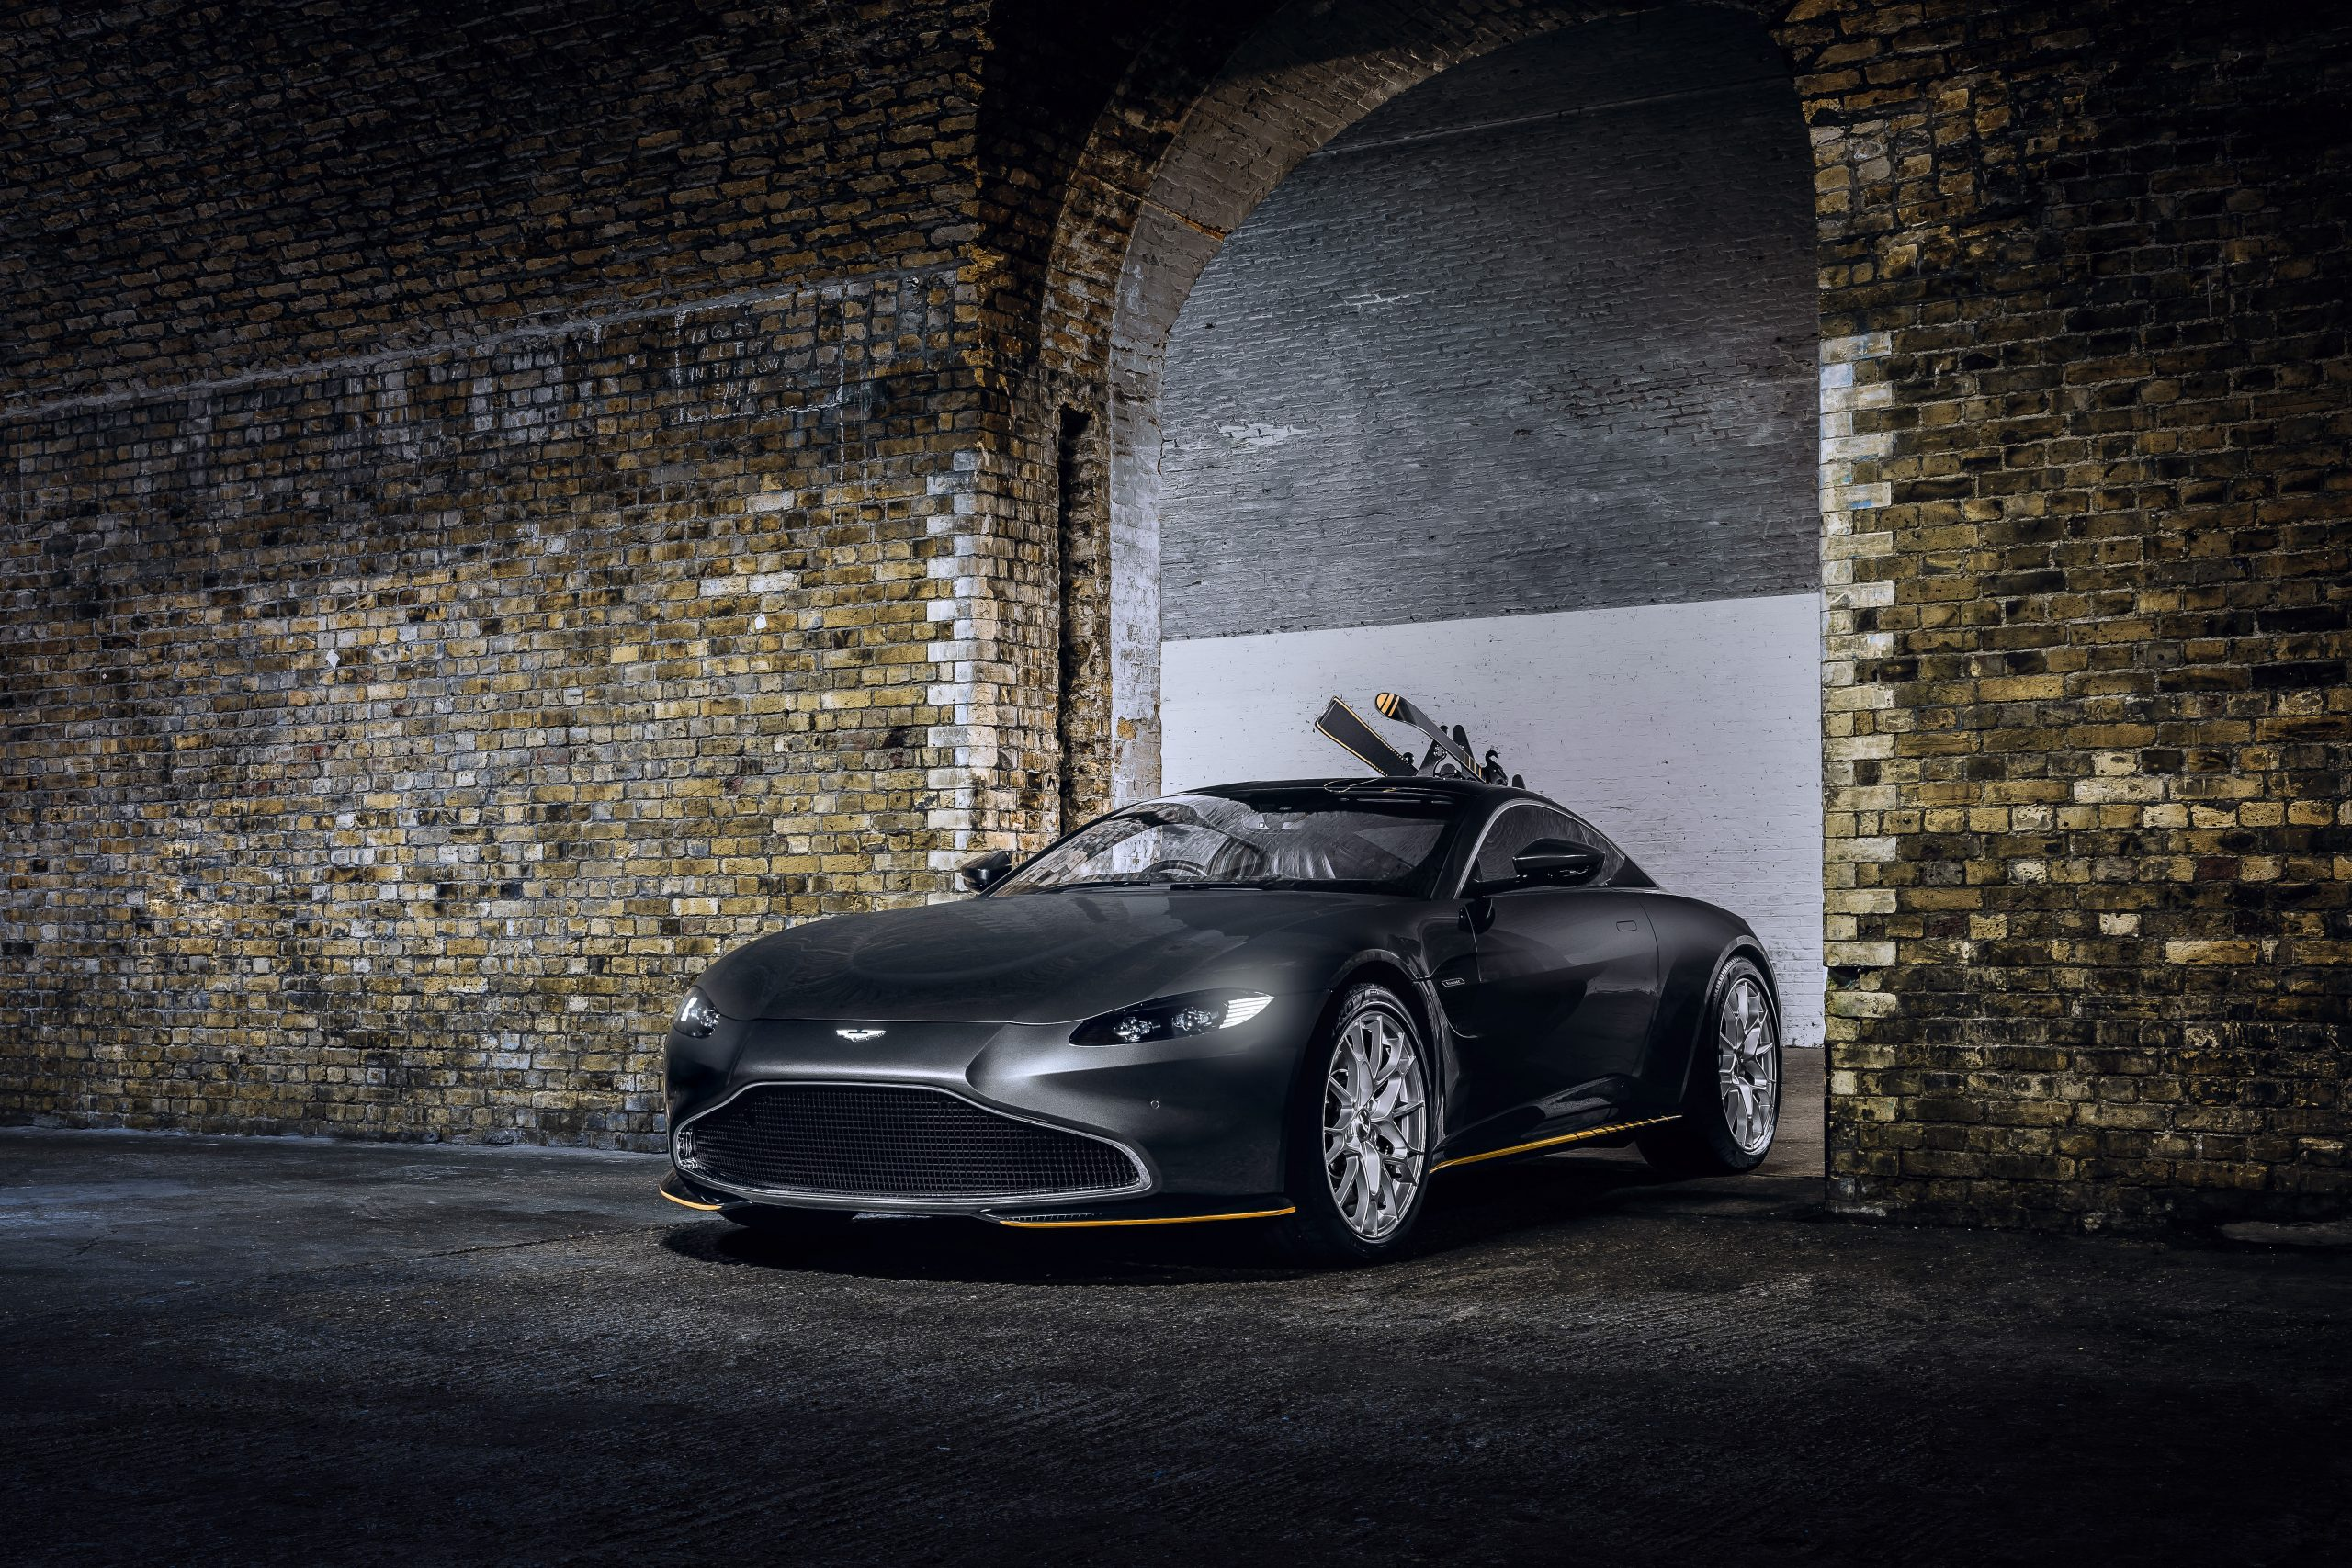 Aston Martin Vantage 007 Edition front three-quarter